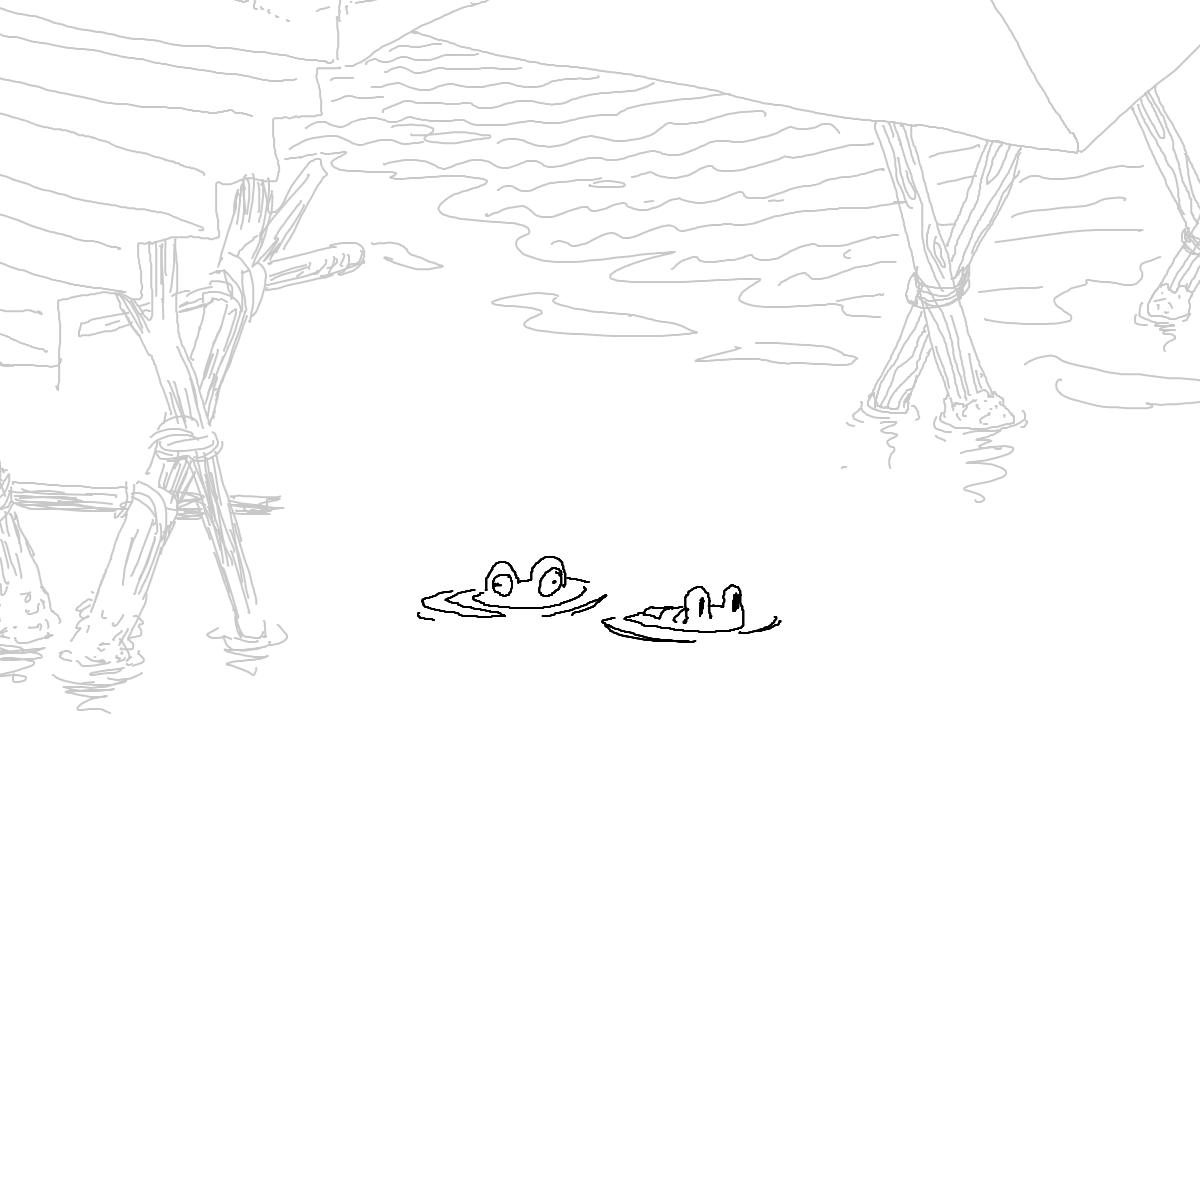 BAAAM drawing#8977 lat:78.4205245971679700lng: -4.4856791496276855